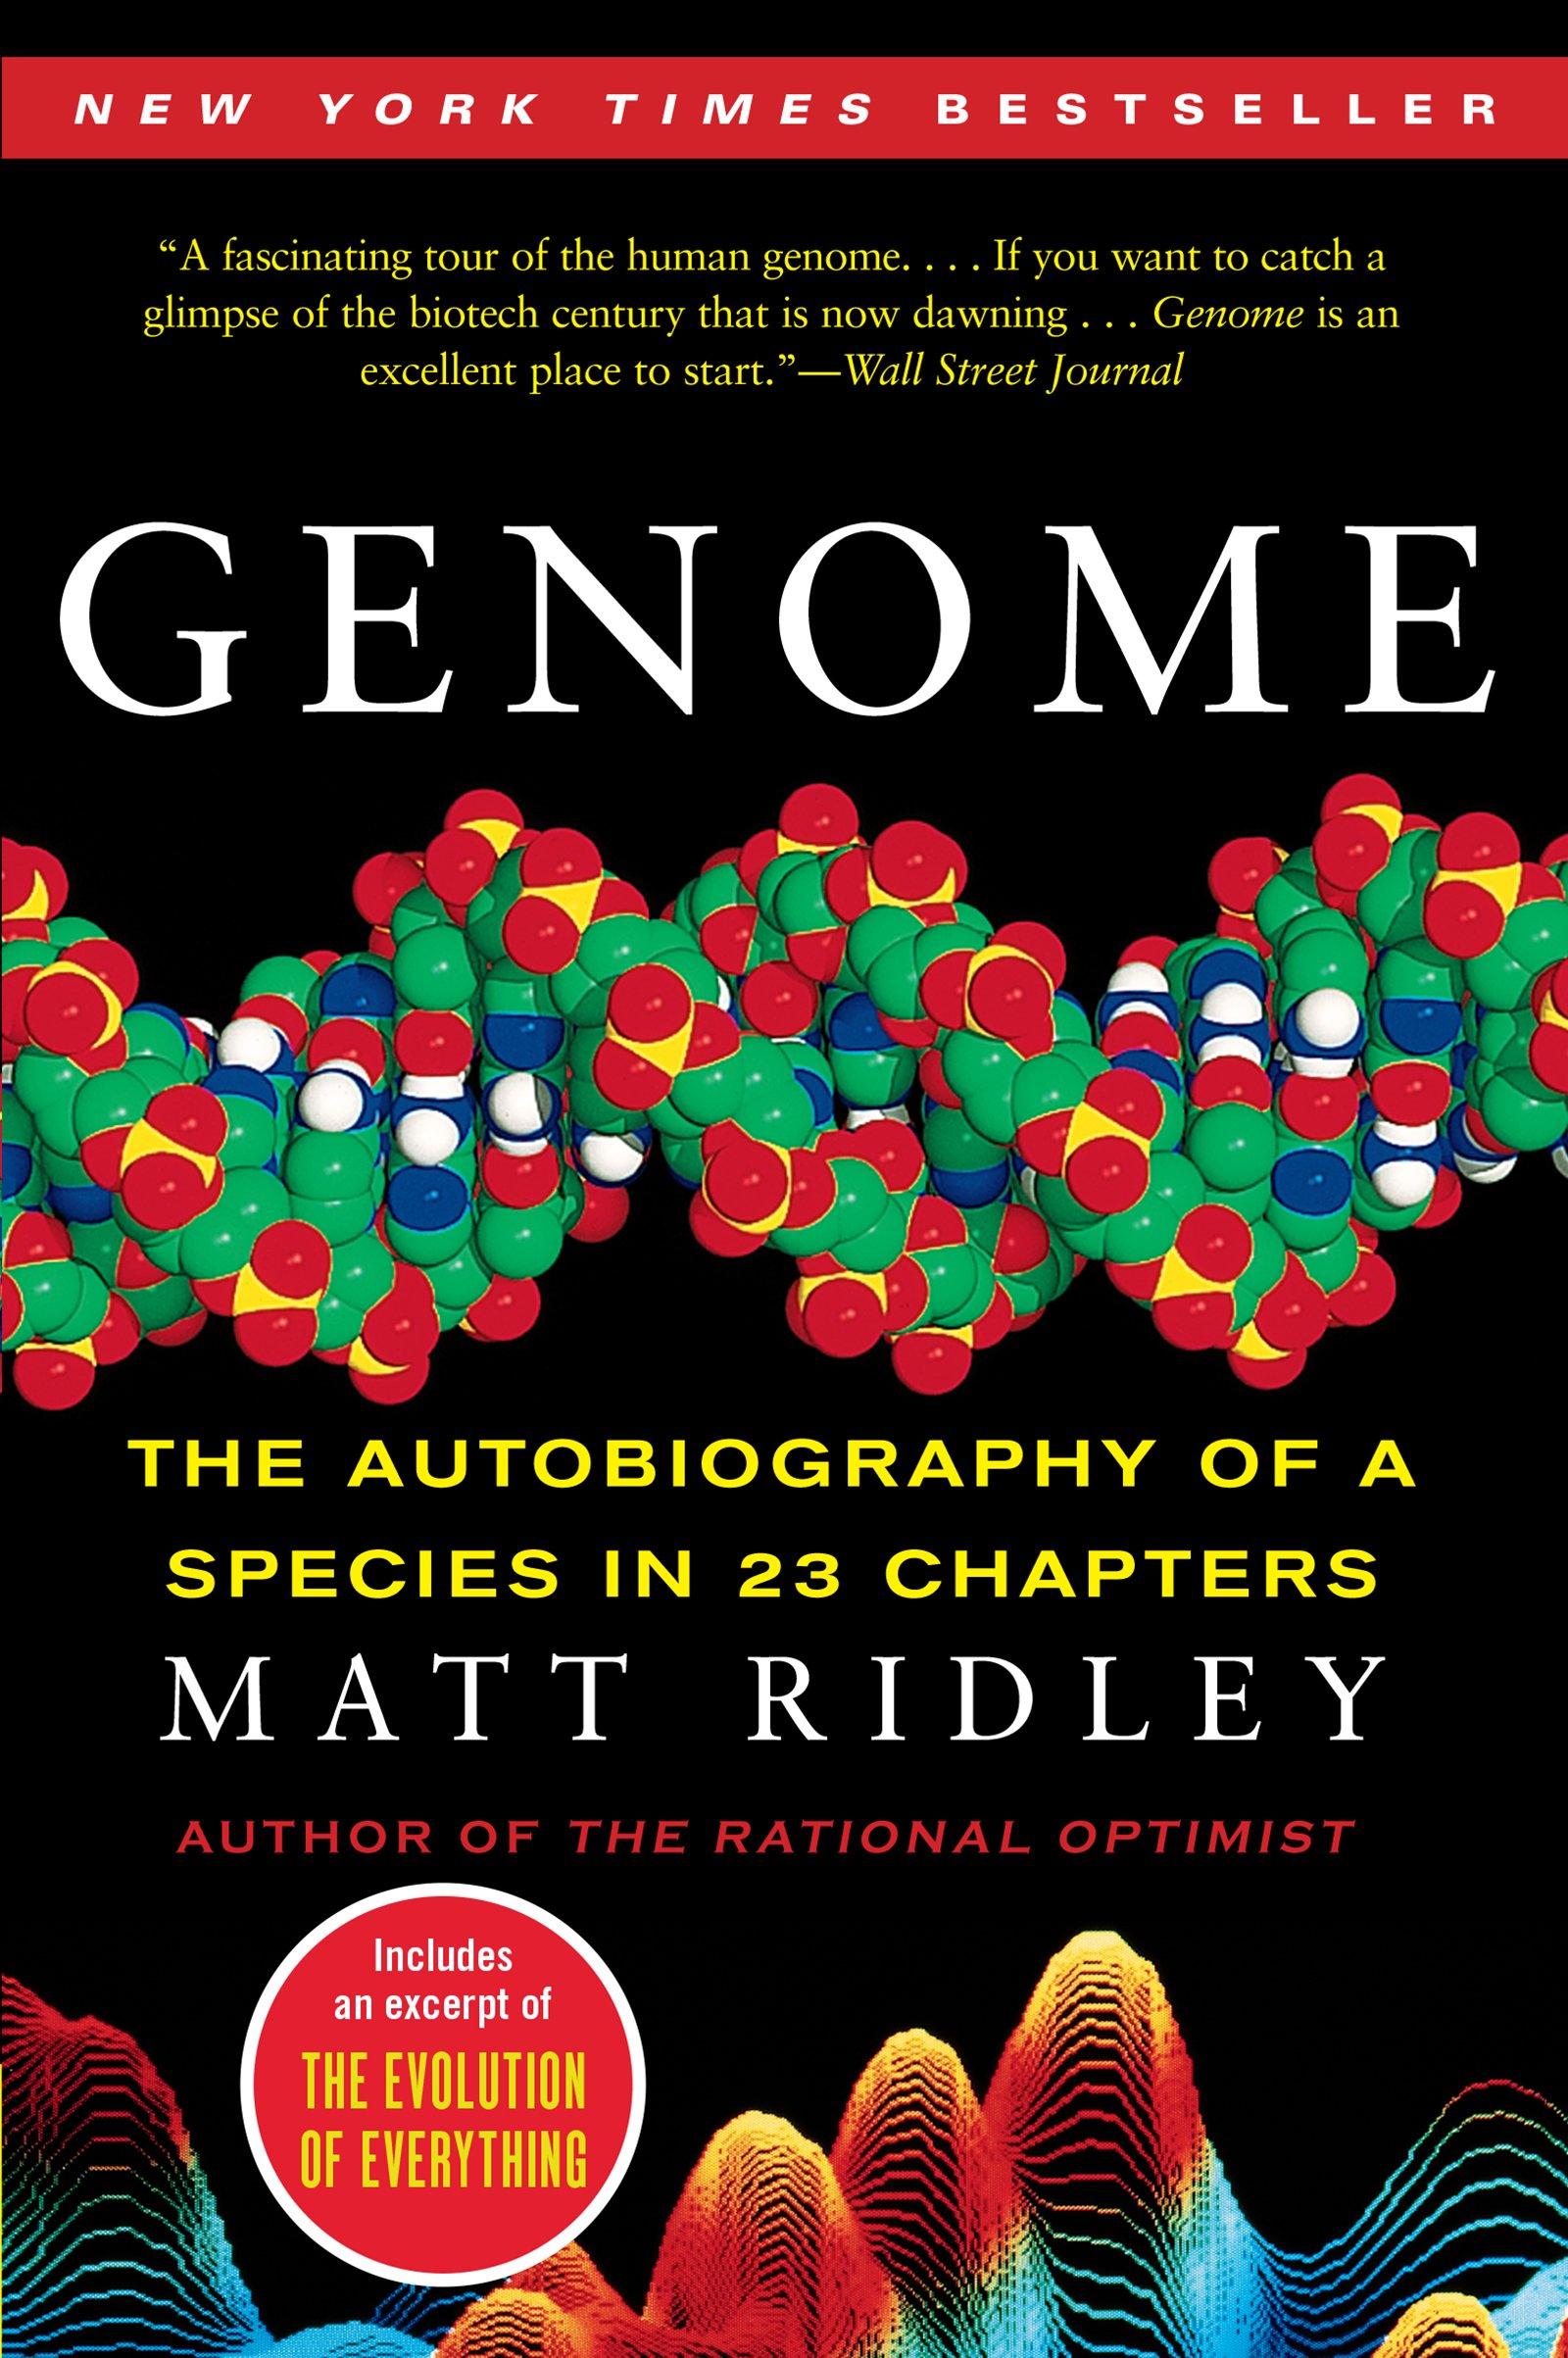 genome-matt-ridley-book-cover